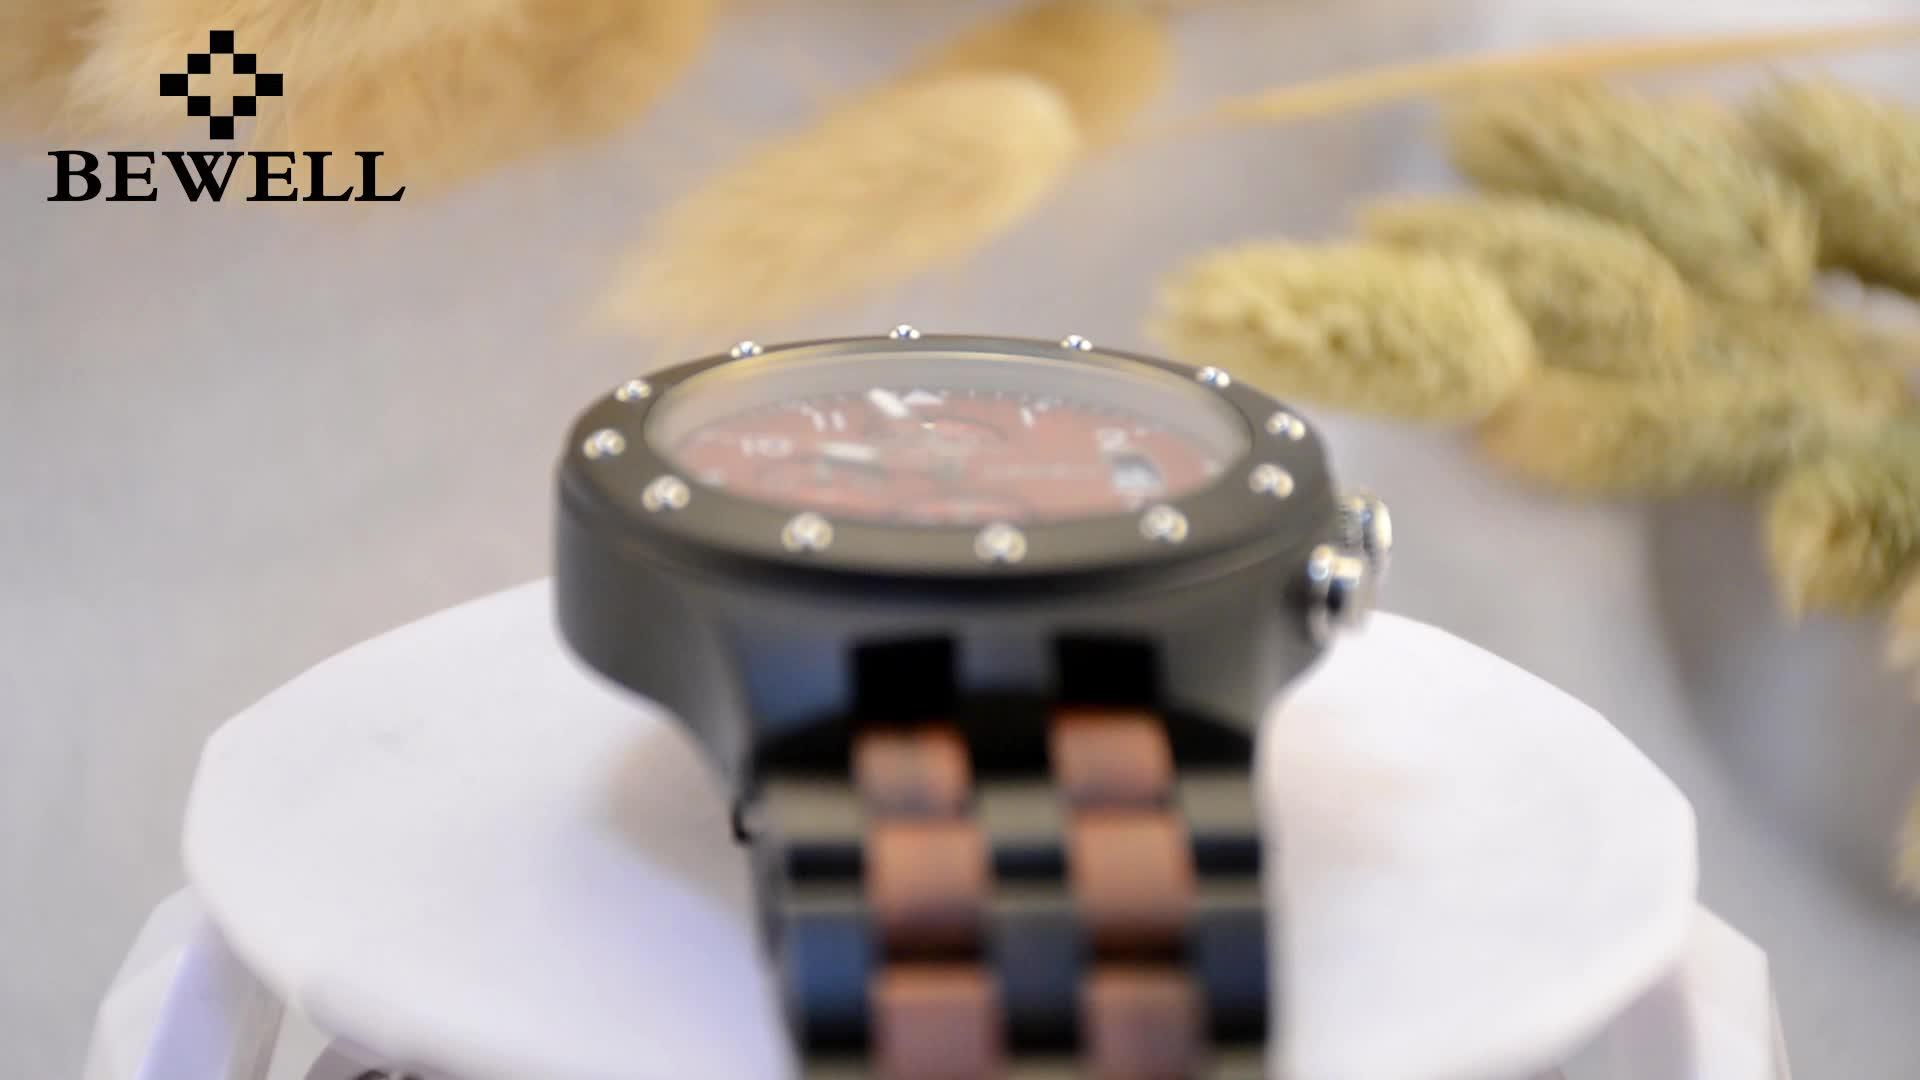 Men Wood BEWELL Vintage Men's Luxury Brand Watches Quartz Wooden Watch